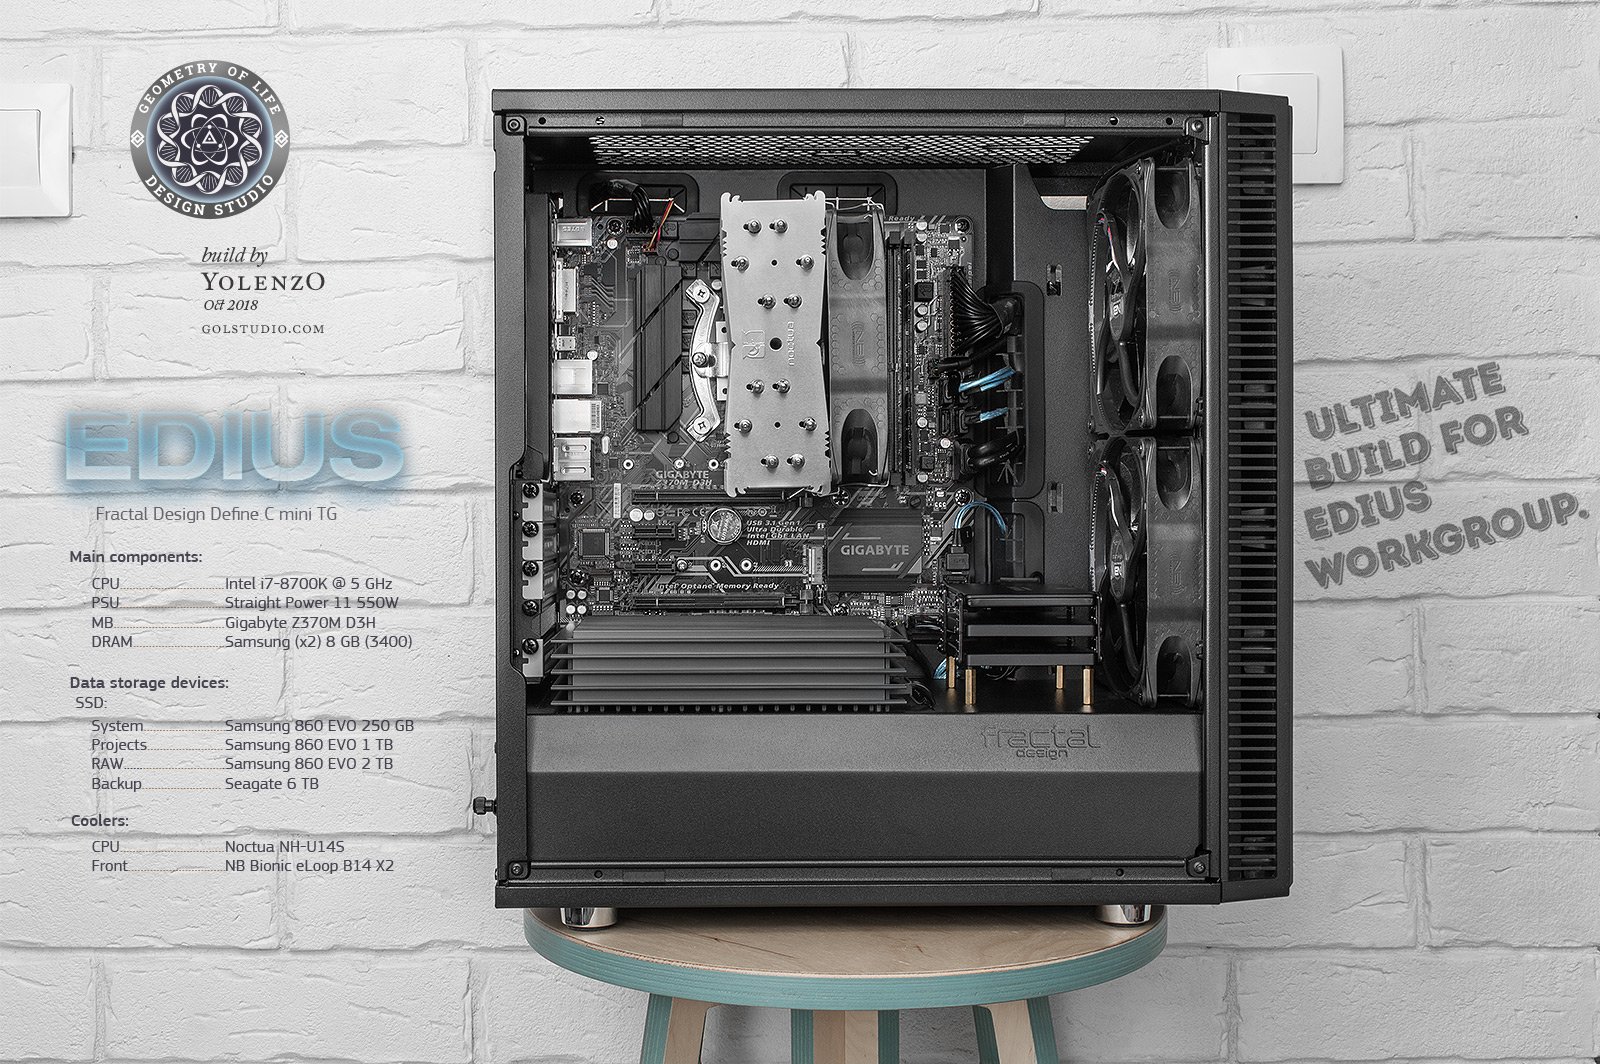 Собираем компьютер EDIUS